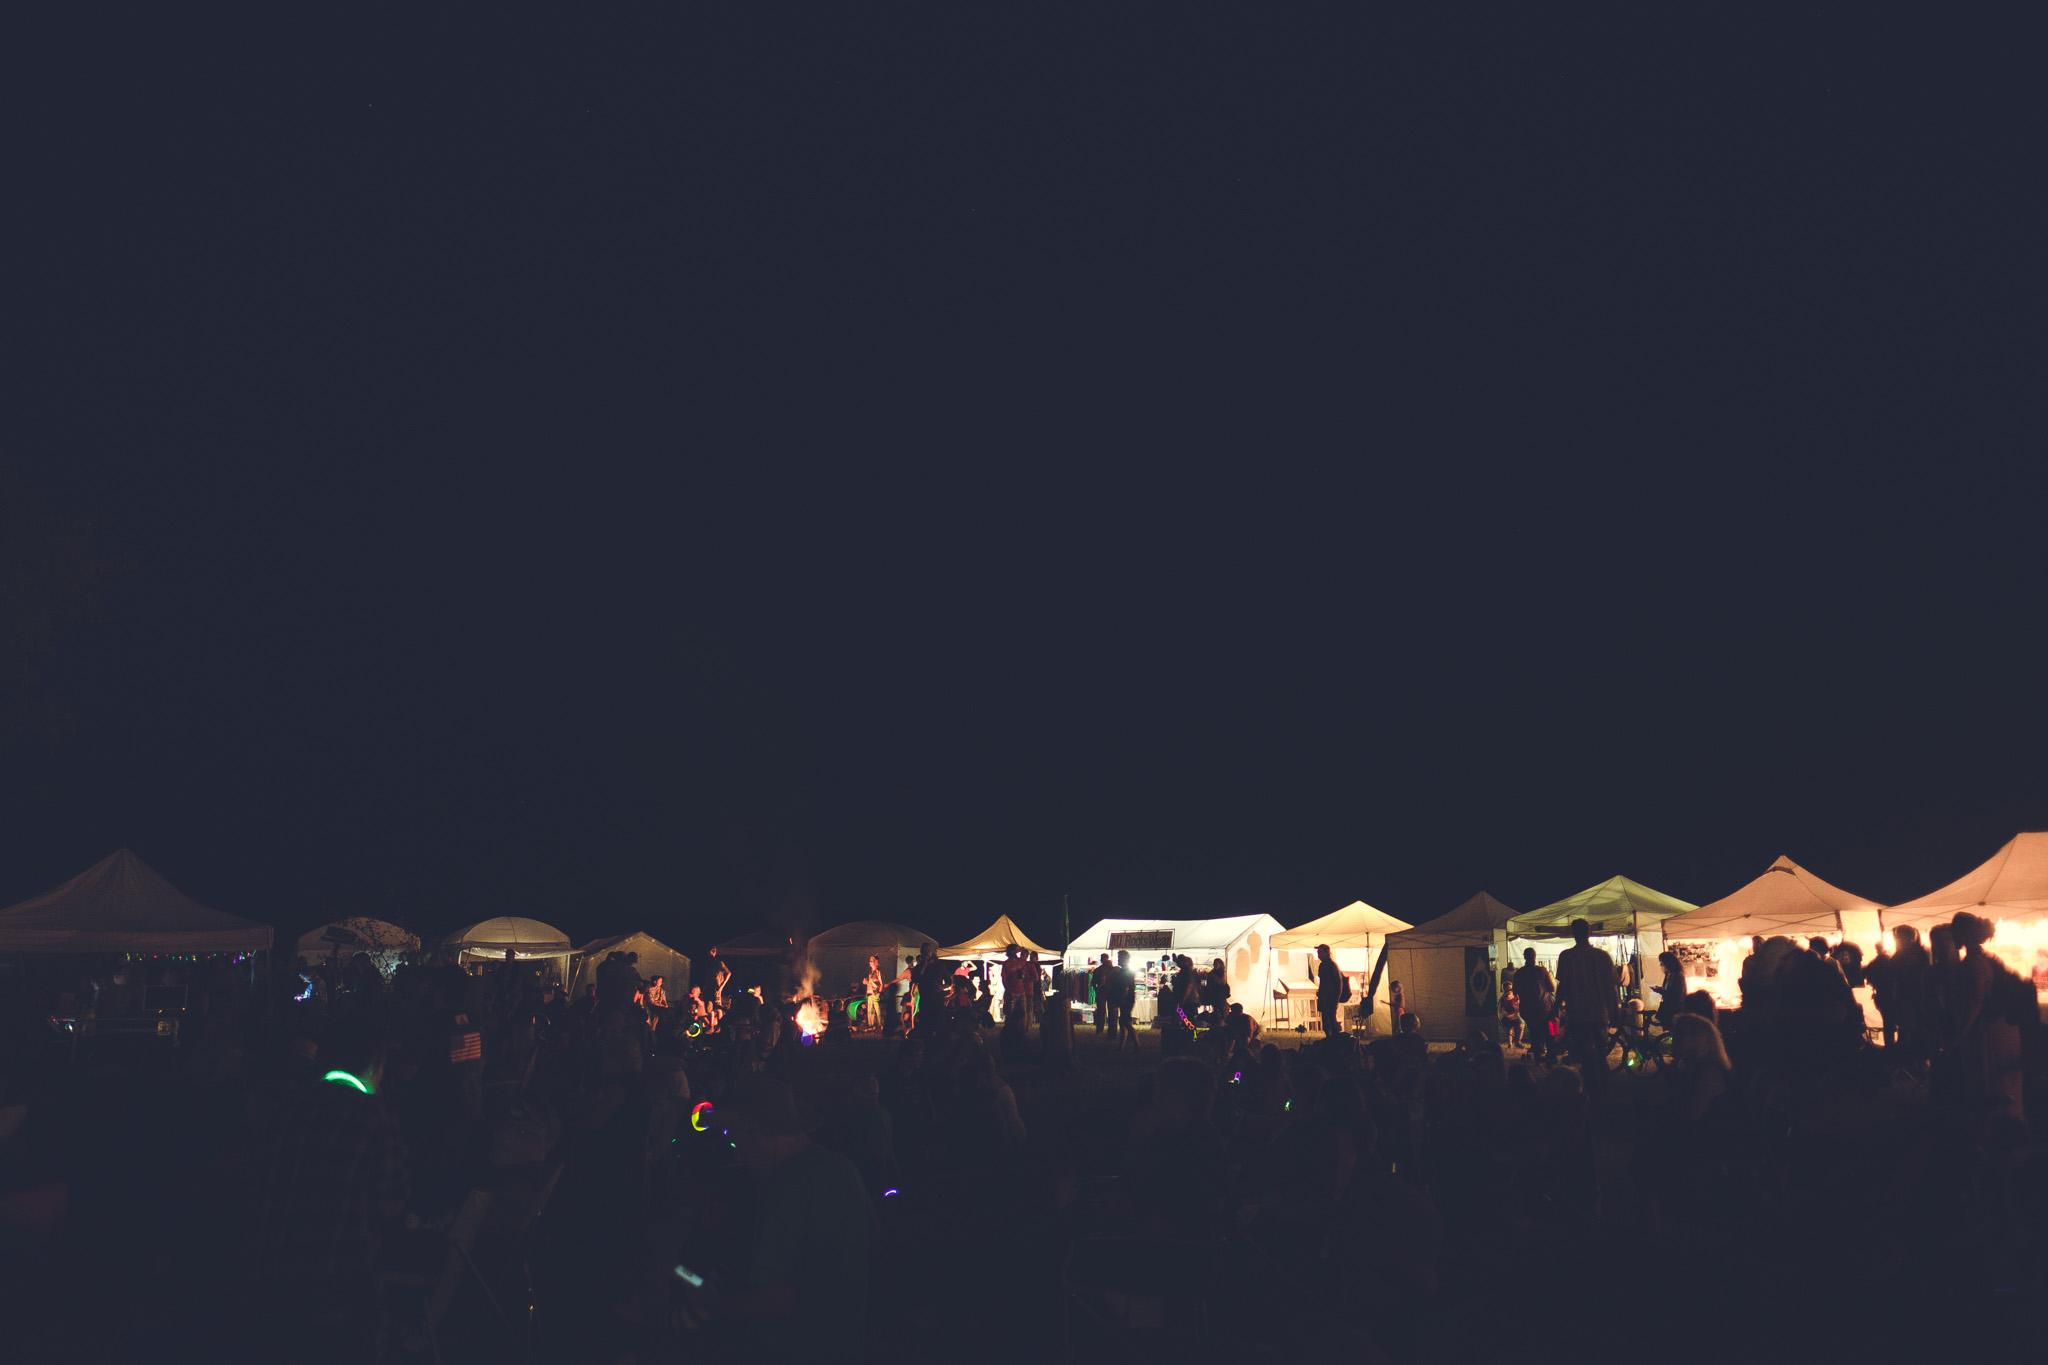 Earthwork Harvest Gathering 2017 - brockit 204945